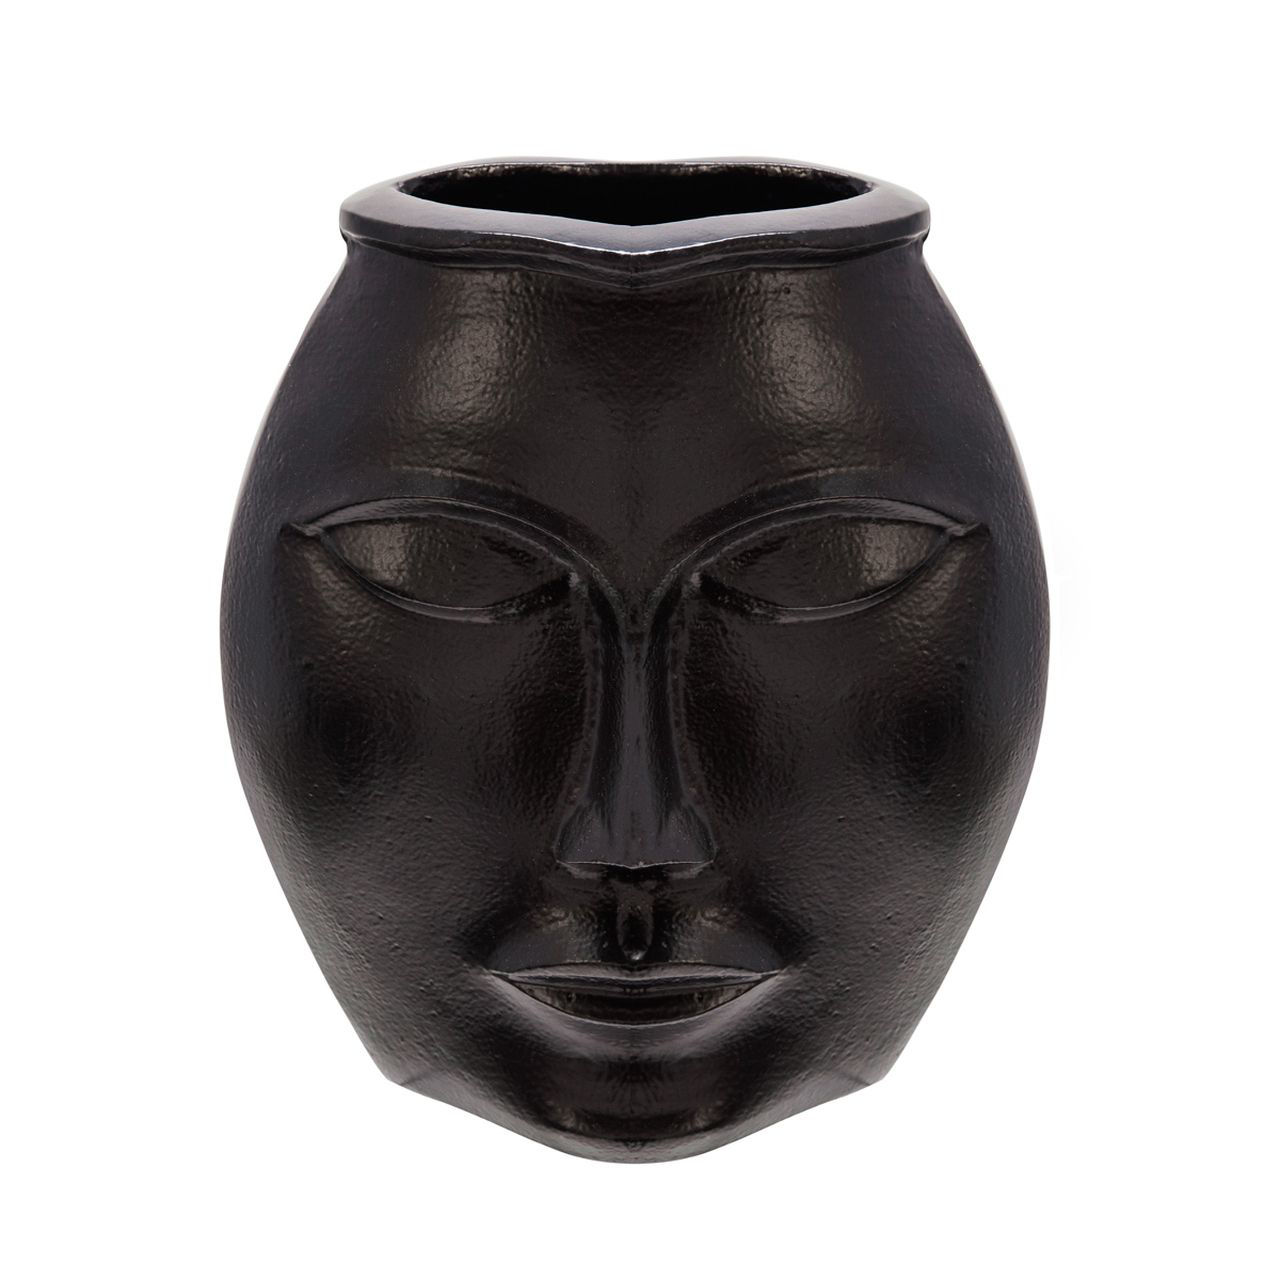 Picture of BLACK METAL DECORATIVE FACE VASE